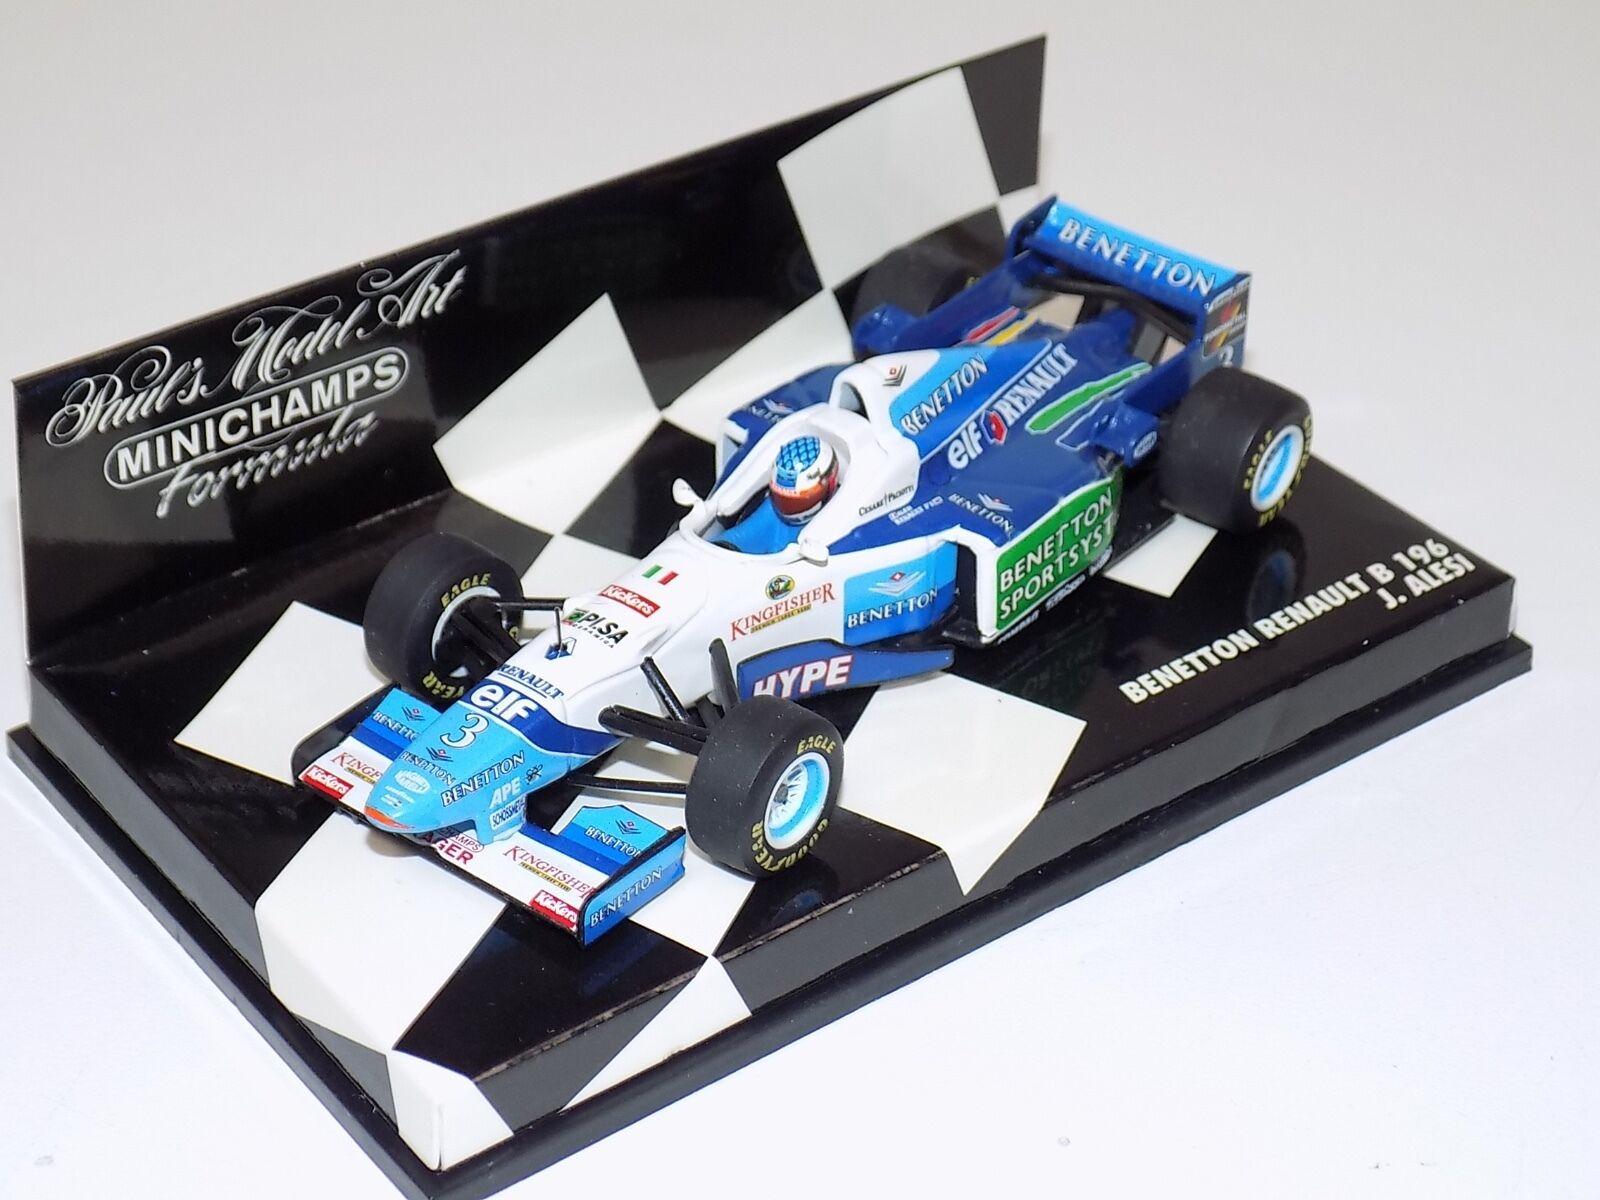 entrega gratis 1 43 Minichamps F1 fórmula 1 Renault Renault Renault B196 Benetton J. Alesi 1996